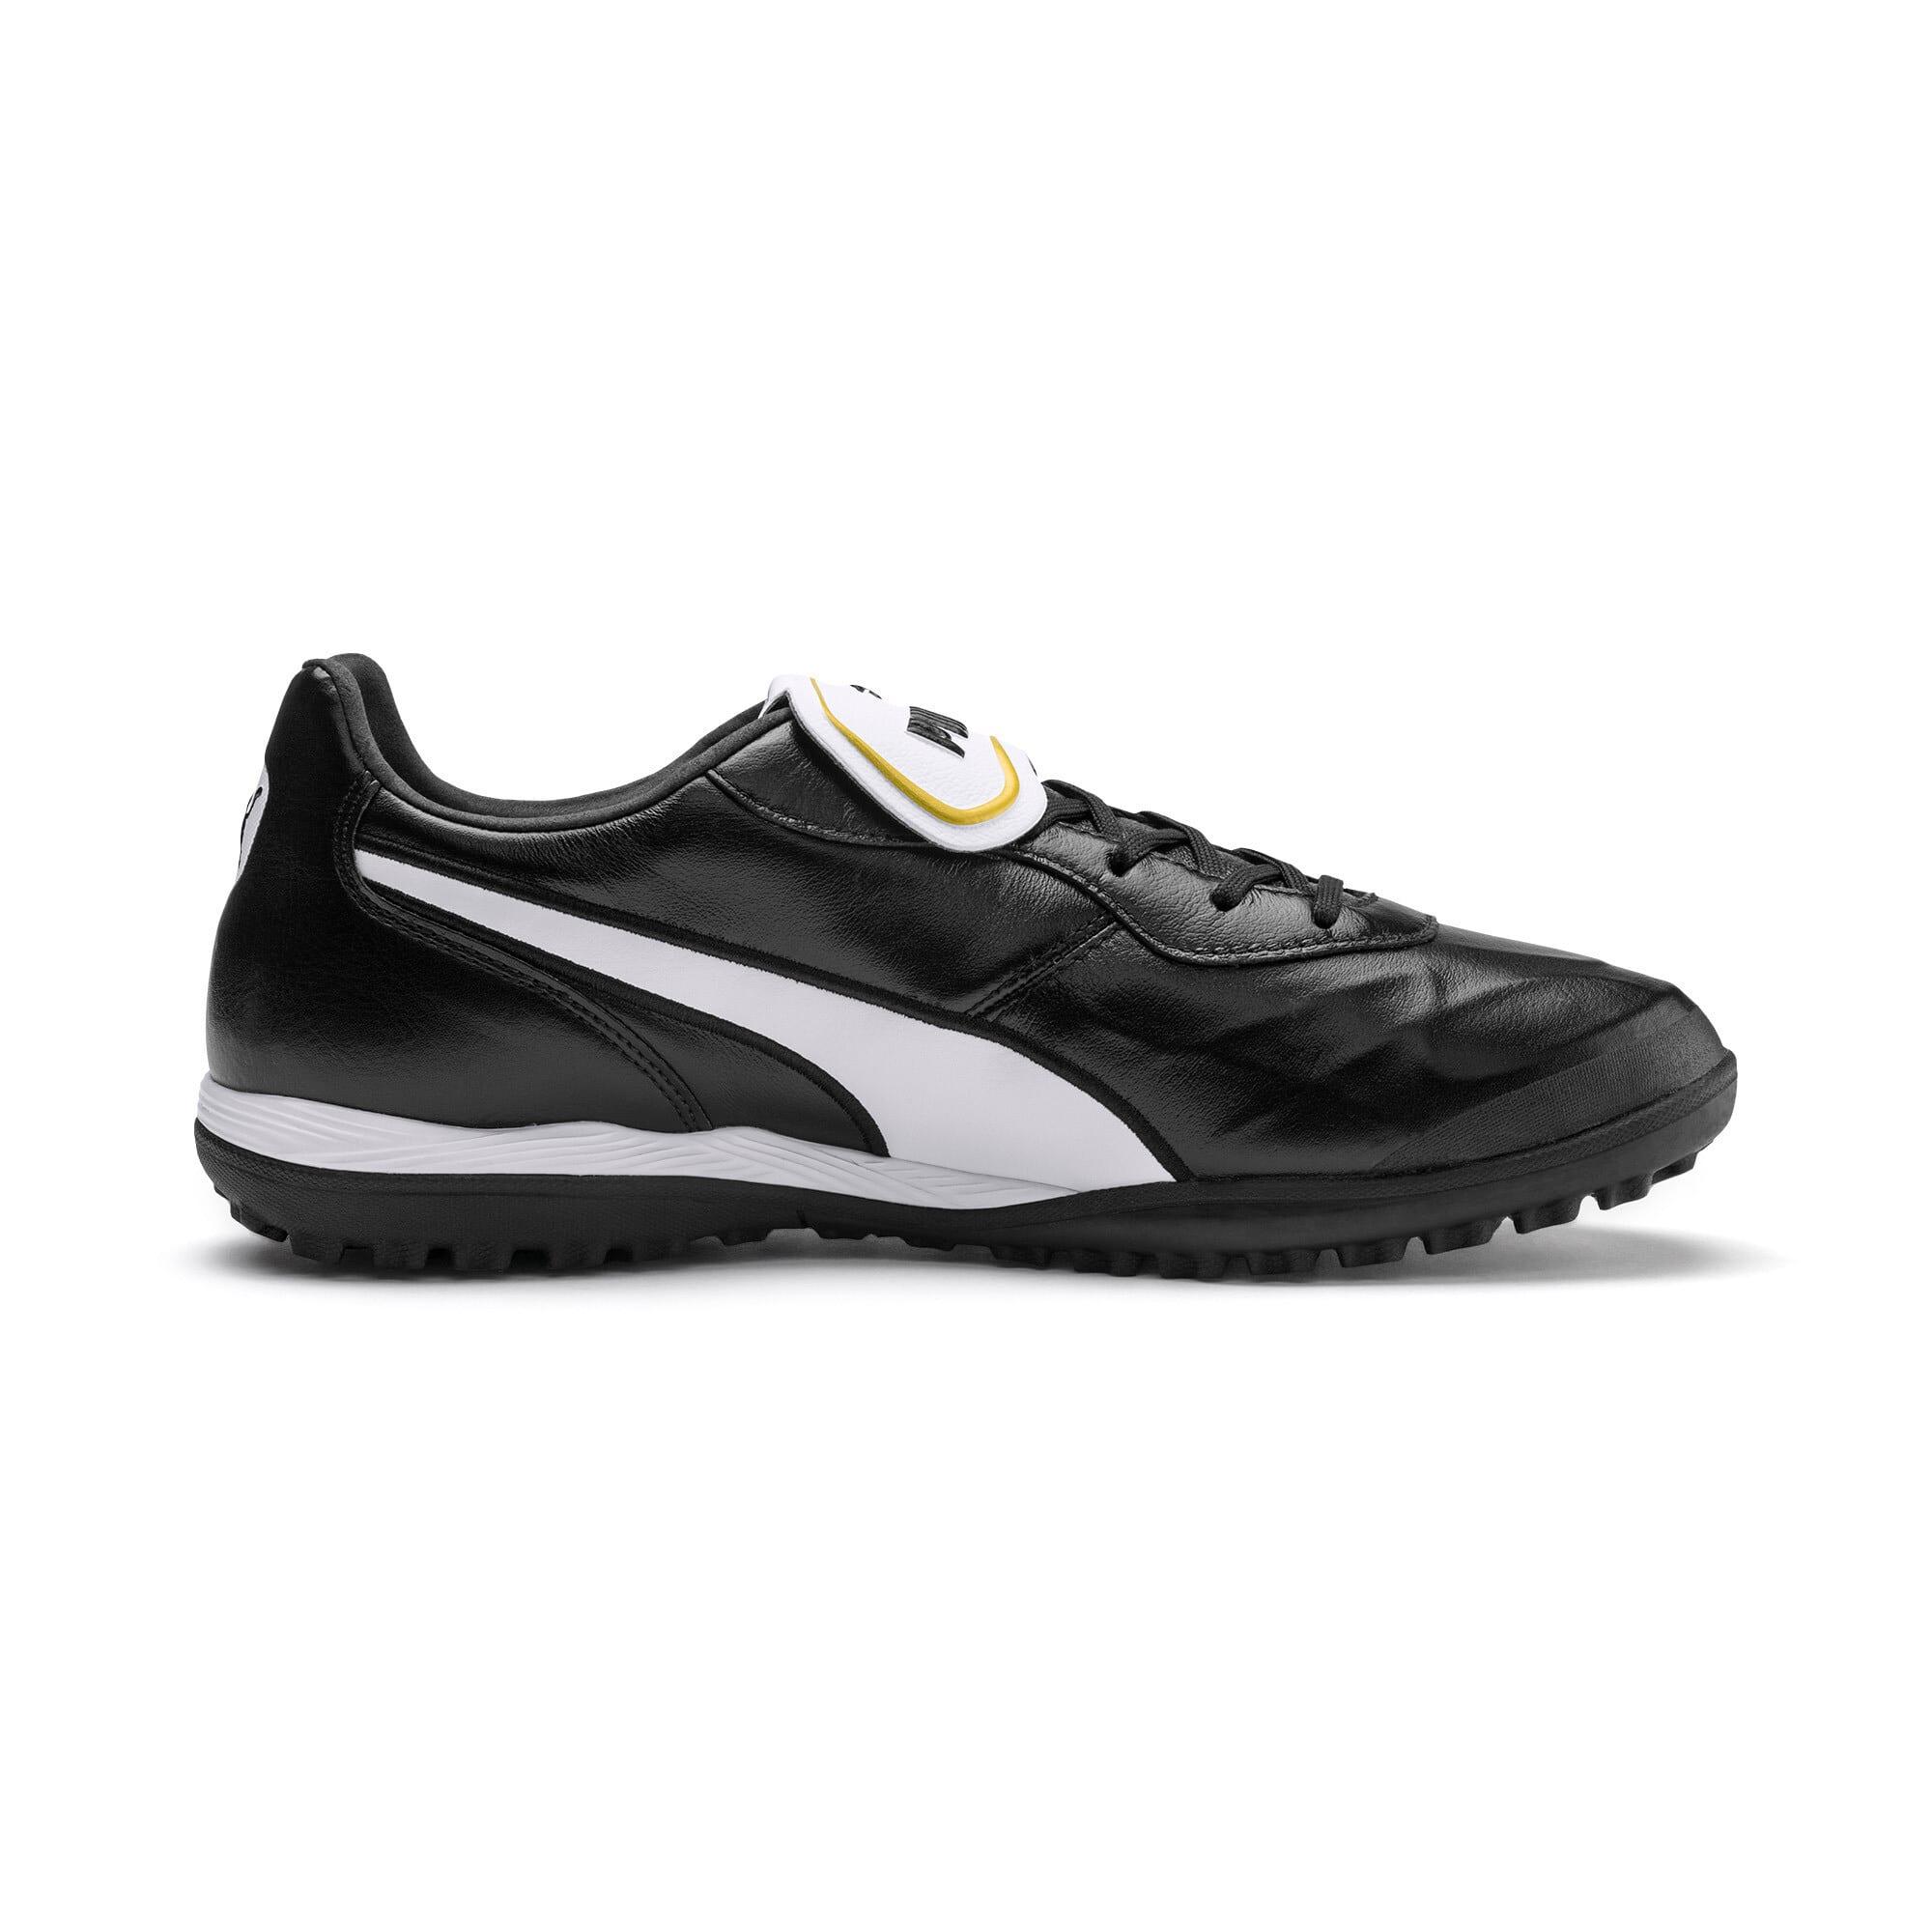 Thumbnail 6 of King Top TT Soccer Shoes, Puma Black-Puma White, medium